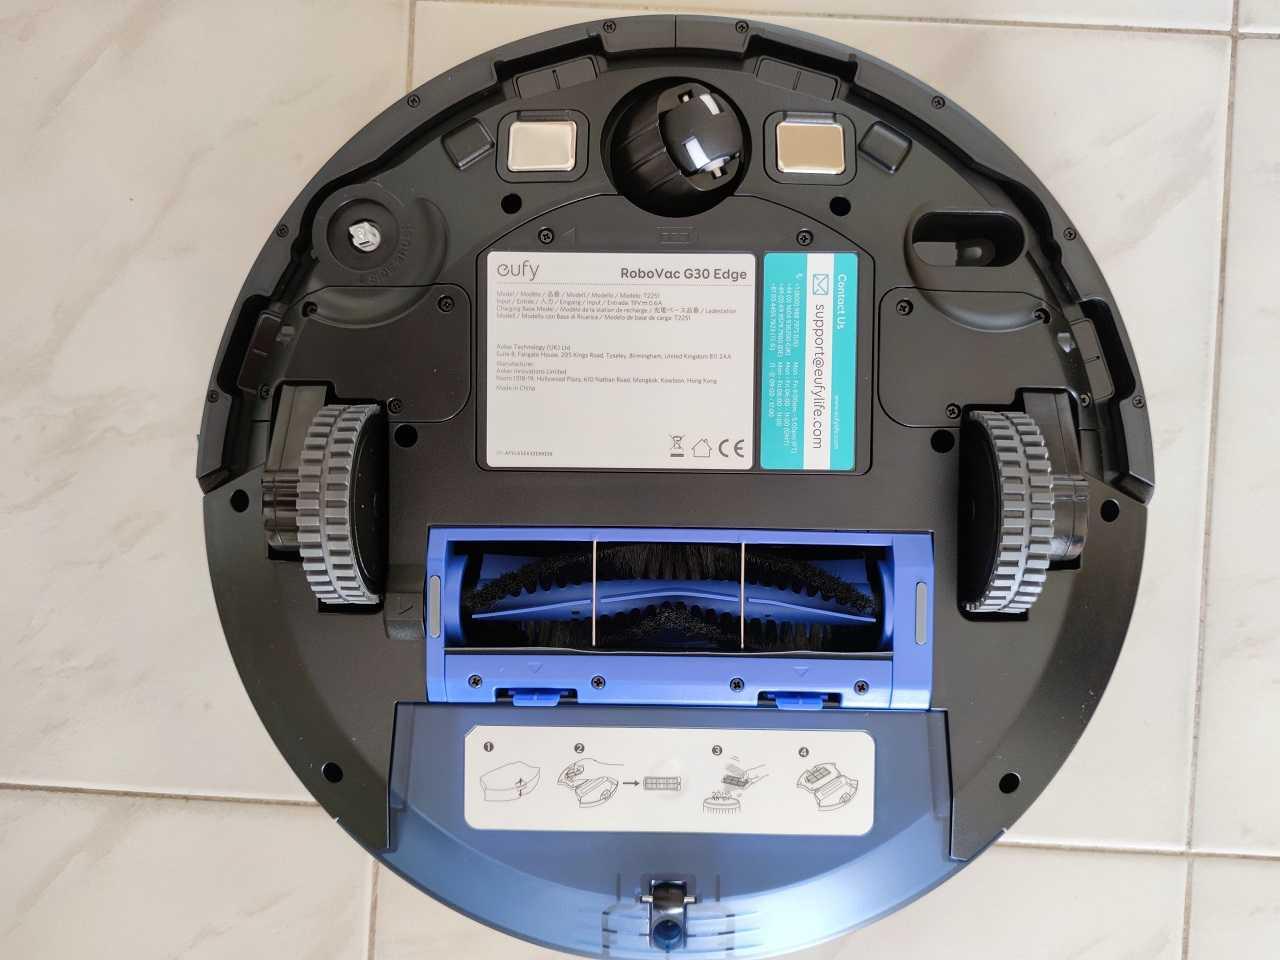 Eufy RoboVac G30 Edge